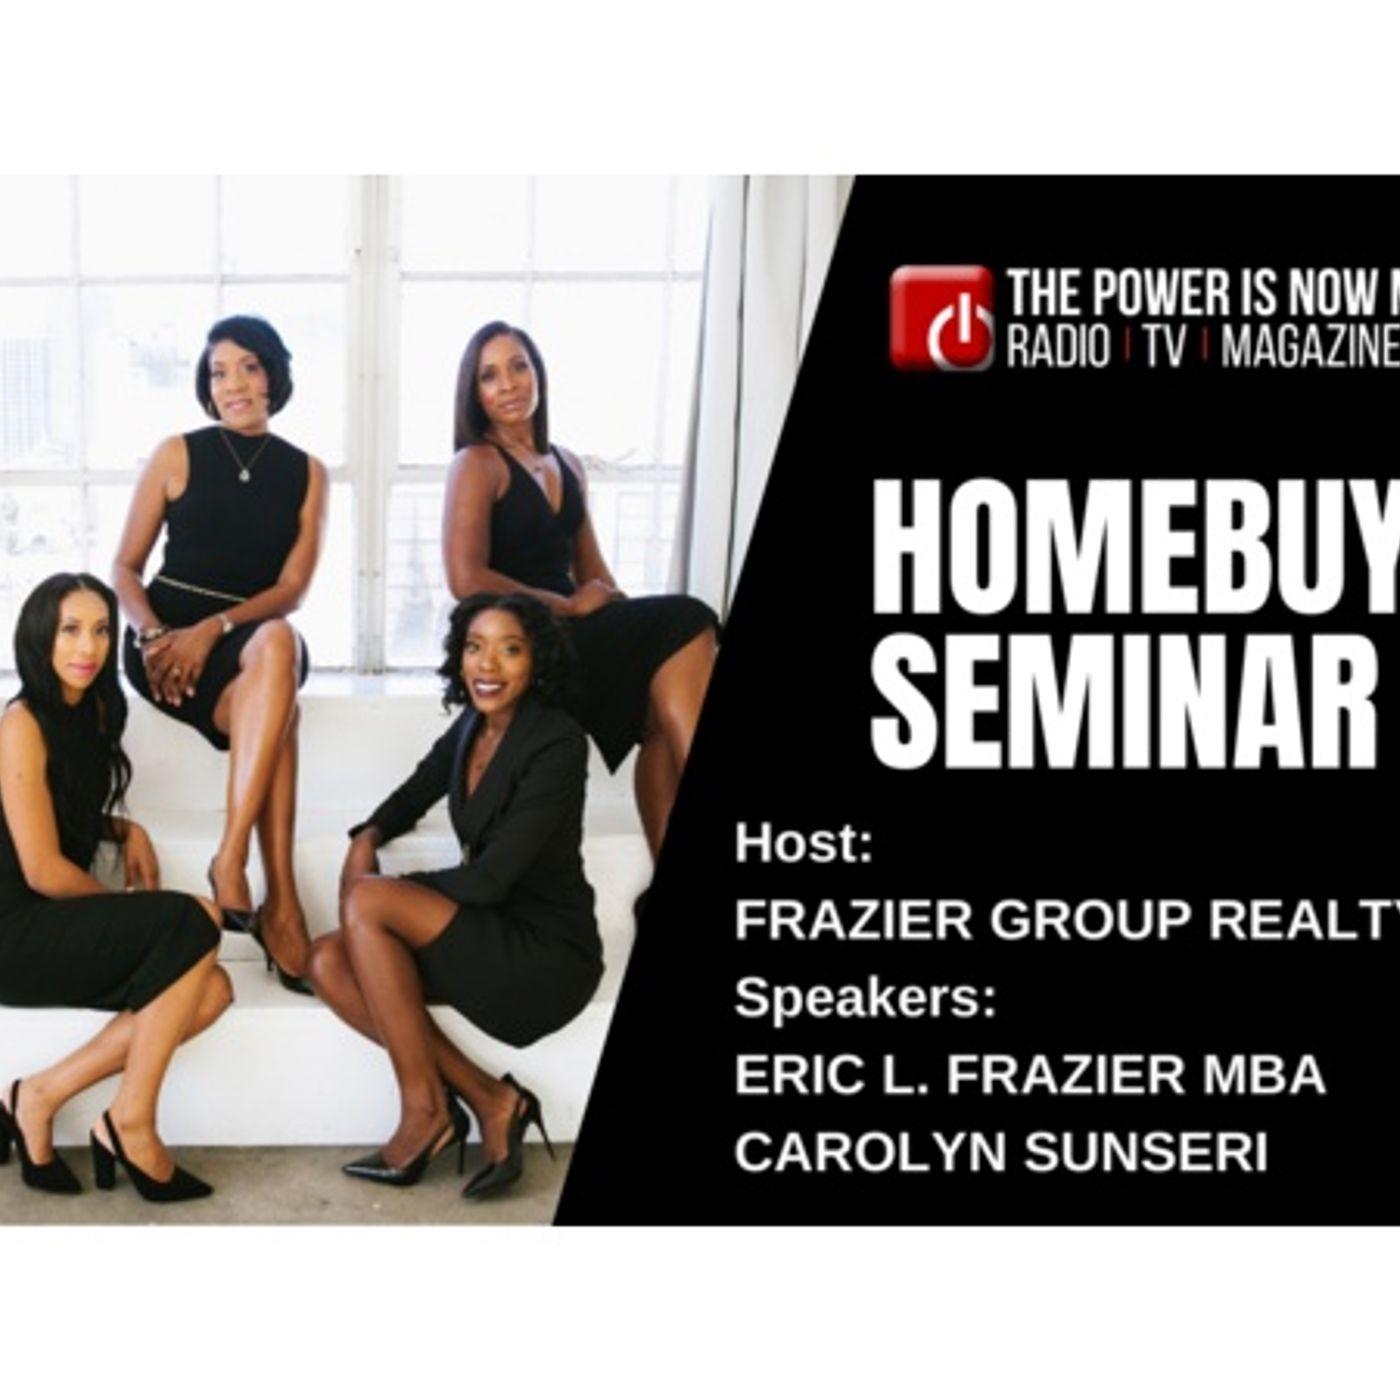 Frazier Group Realty Homebuyer Seminar